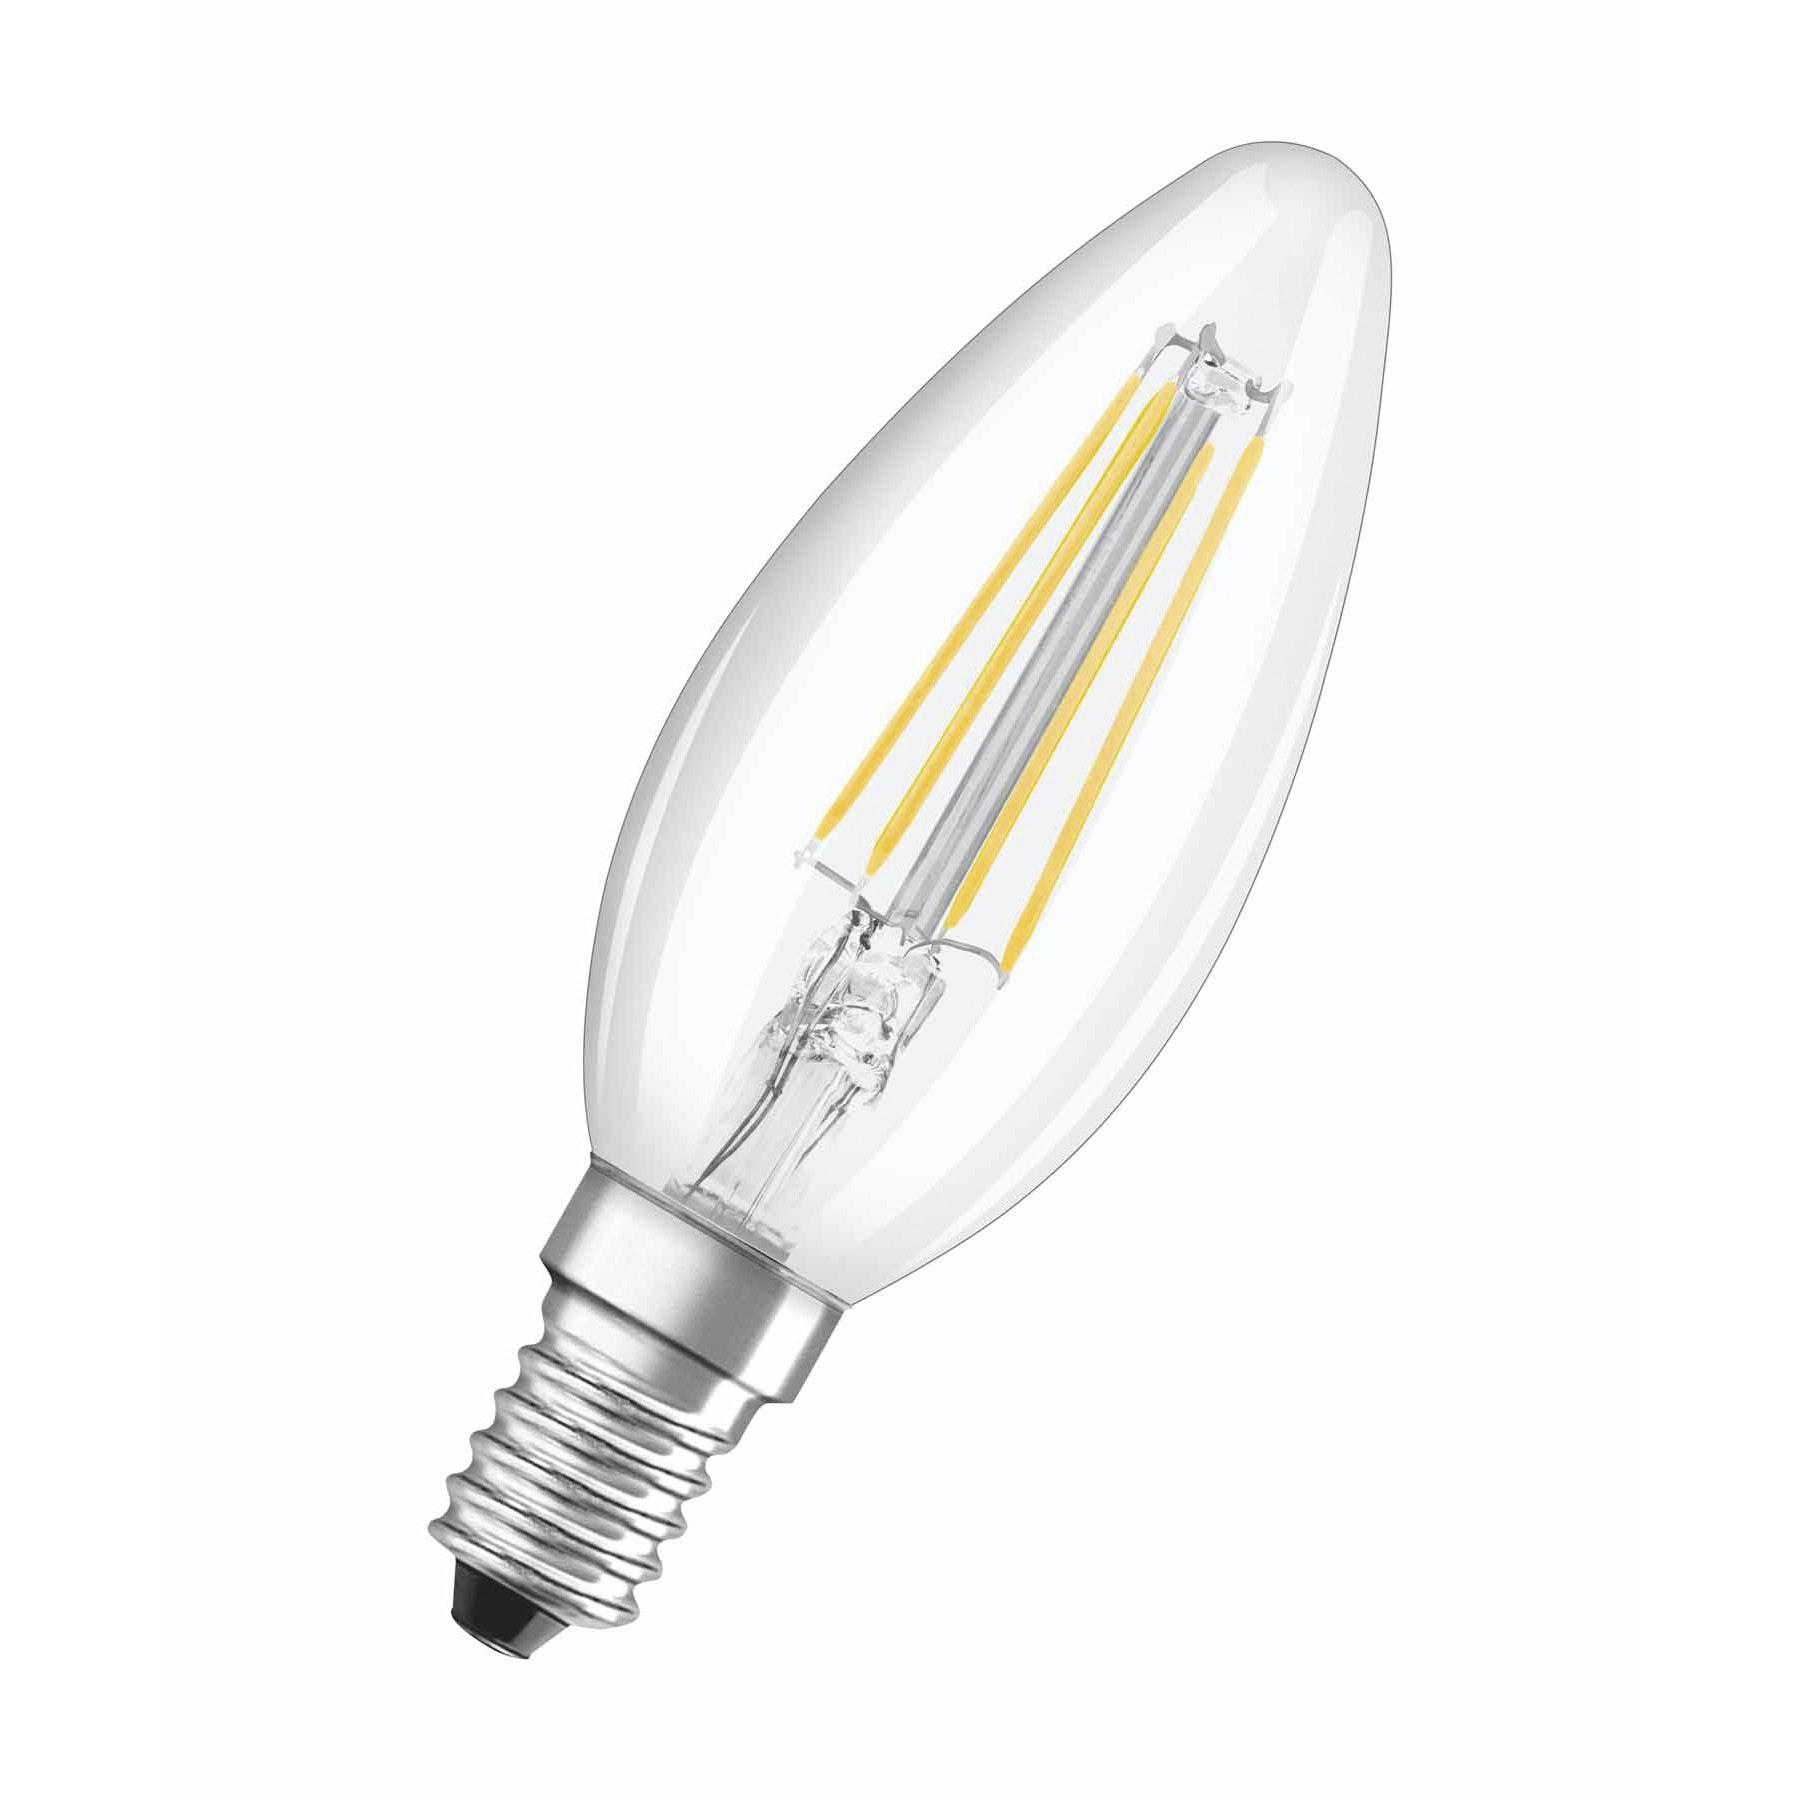 LED-Lampa Osram Retrofit E14 Filament 4W Kron Klar